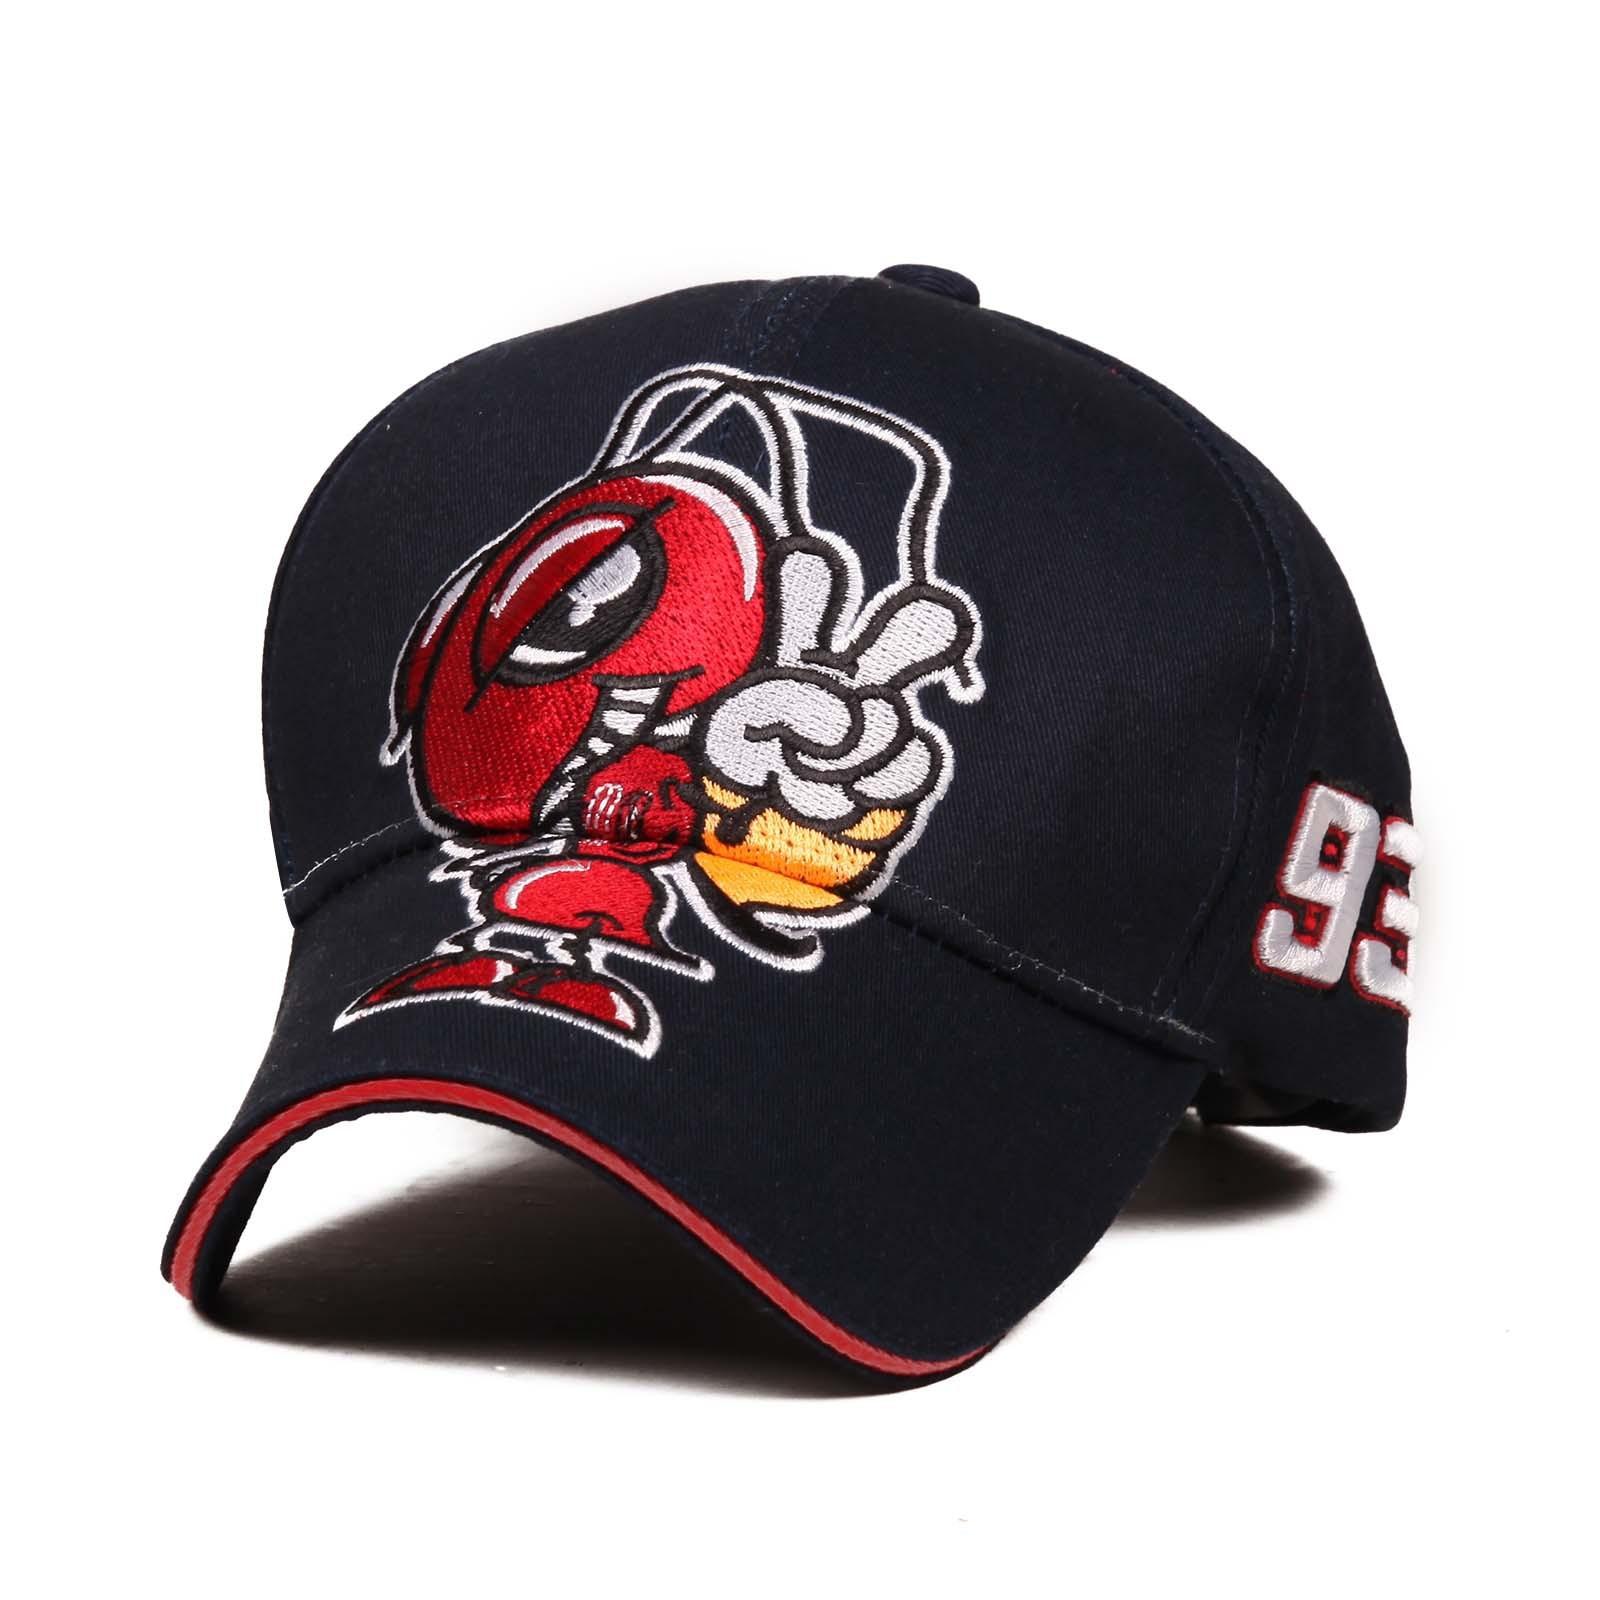 2018 Hot Sale Cosplay Cartoon Big Ant Embroidery Moto GP Marc Marquez  Racing Baseball Cap Hat Men Women Sports Snapback Hats-in Baseball Caps  from Apparel ... d308f853346f